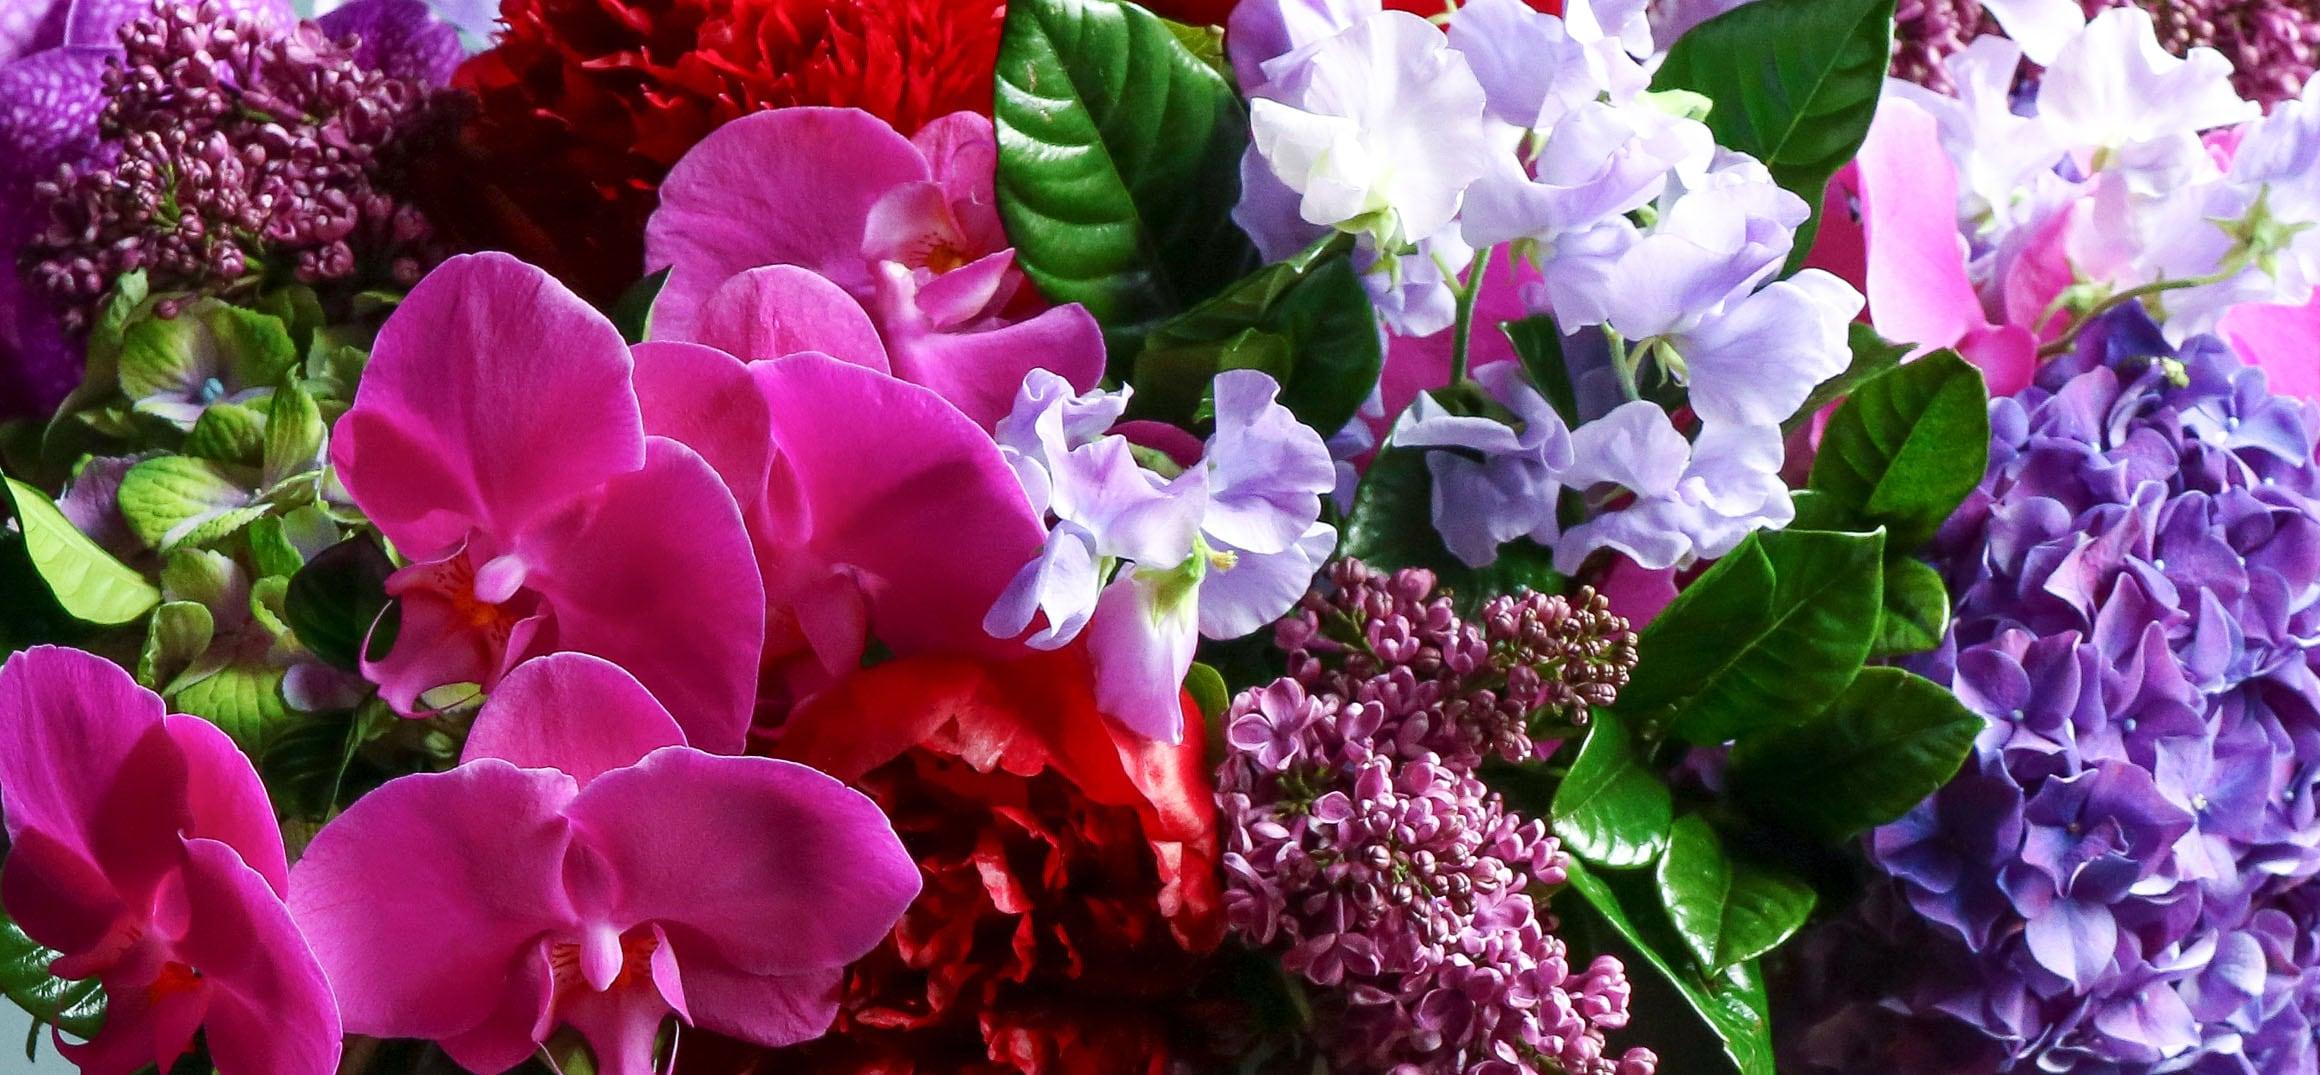 Luxe Flowers & Boston Luxury arrangement delivery